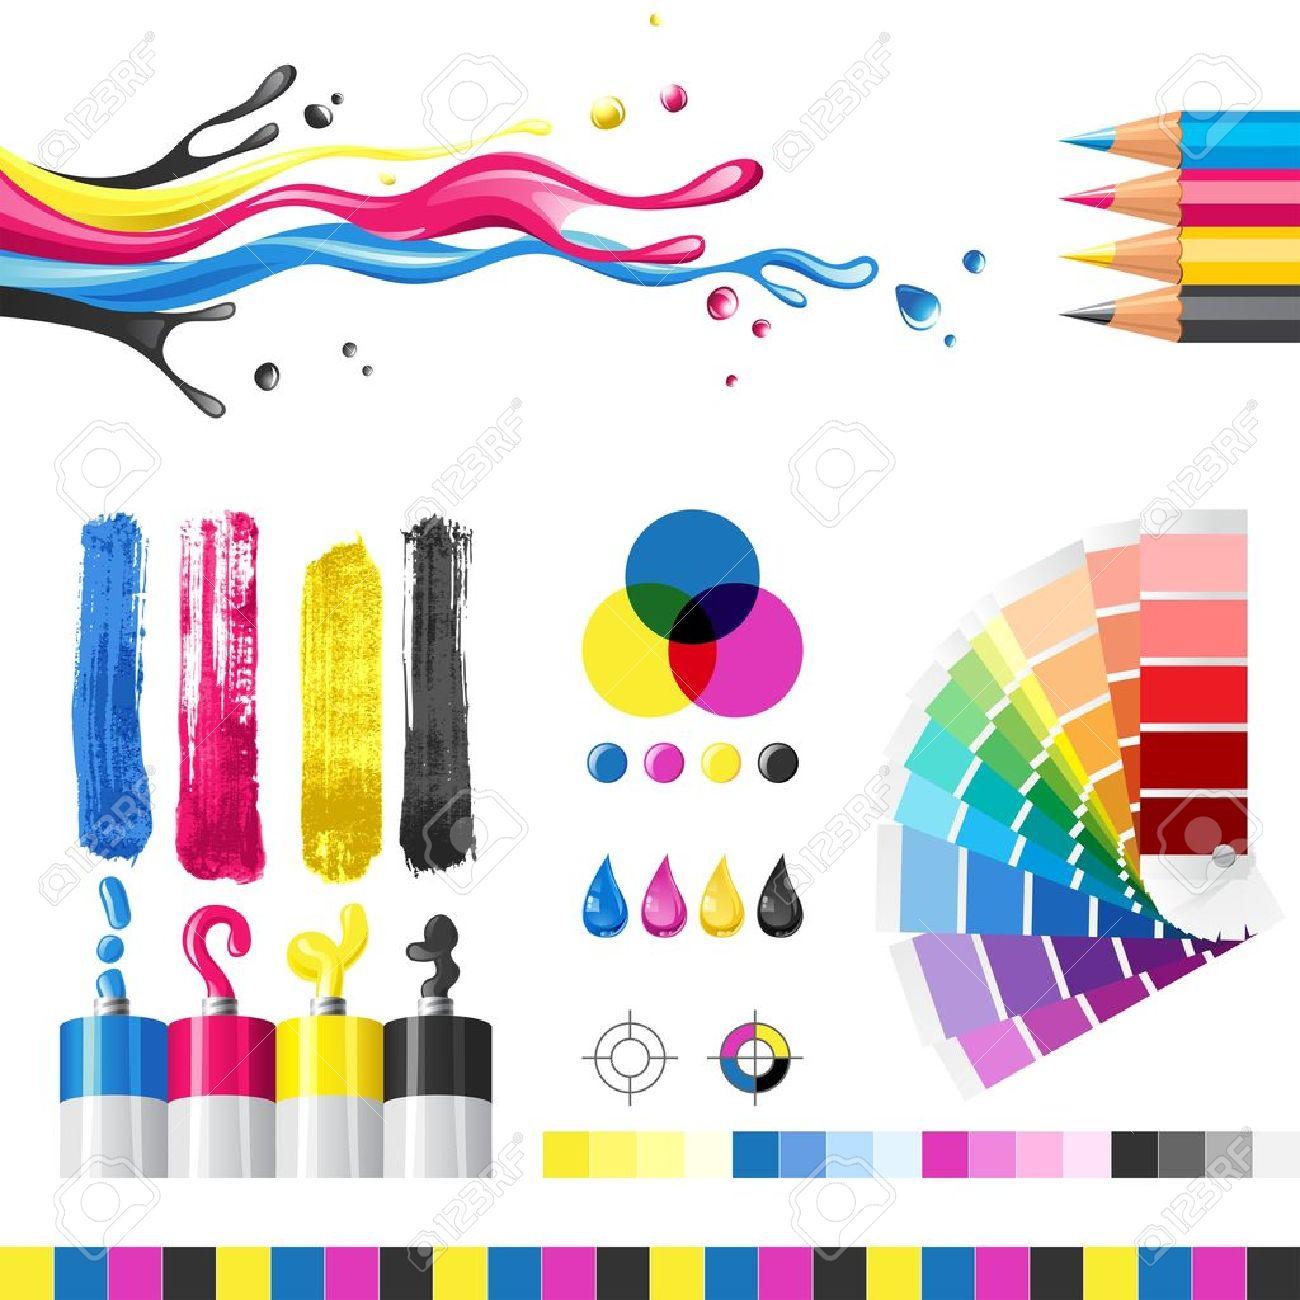 Cmyk color mode design elements stock vector 14332256